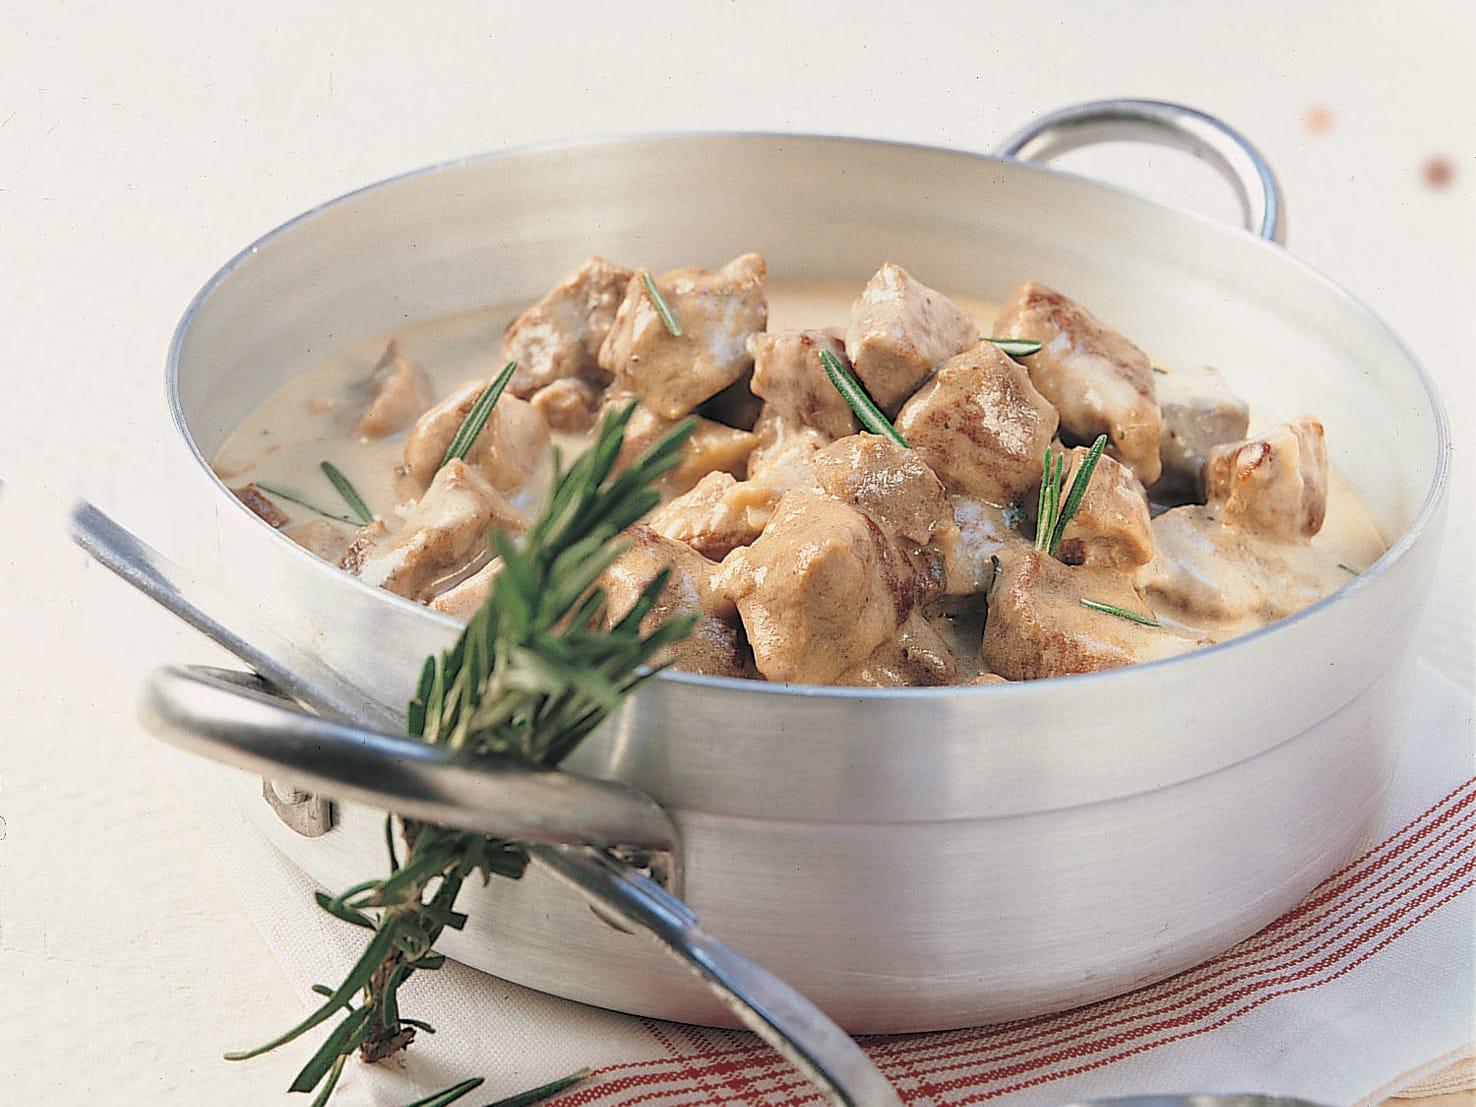 Ragoût de porc et sauce au romarin